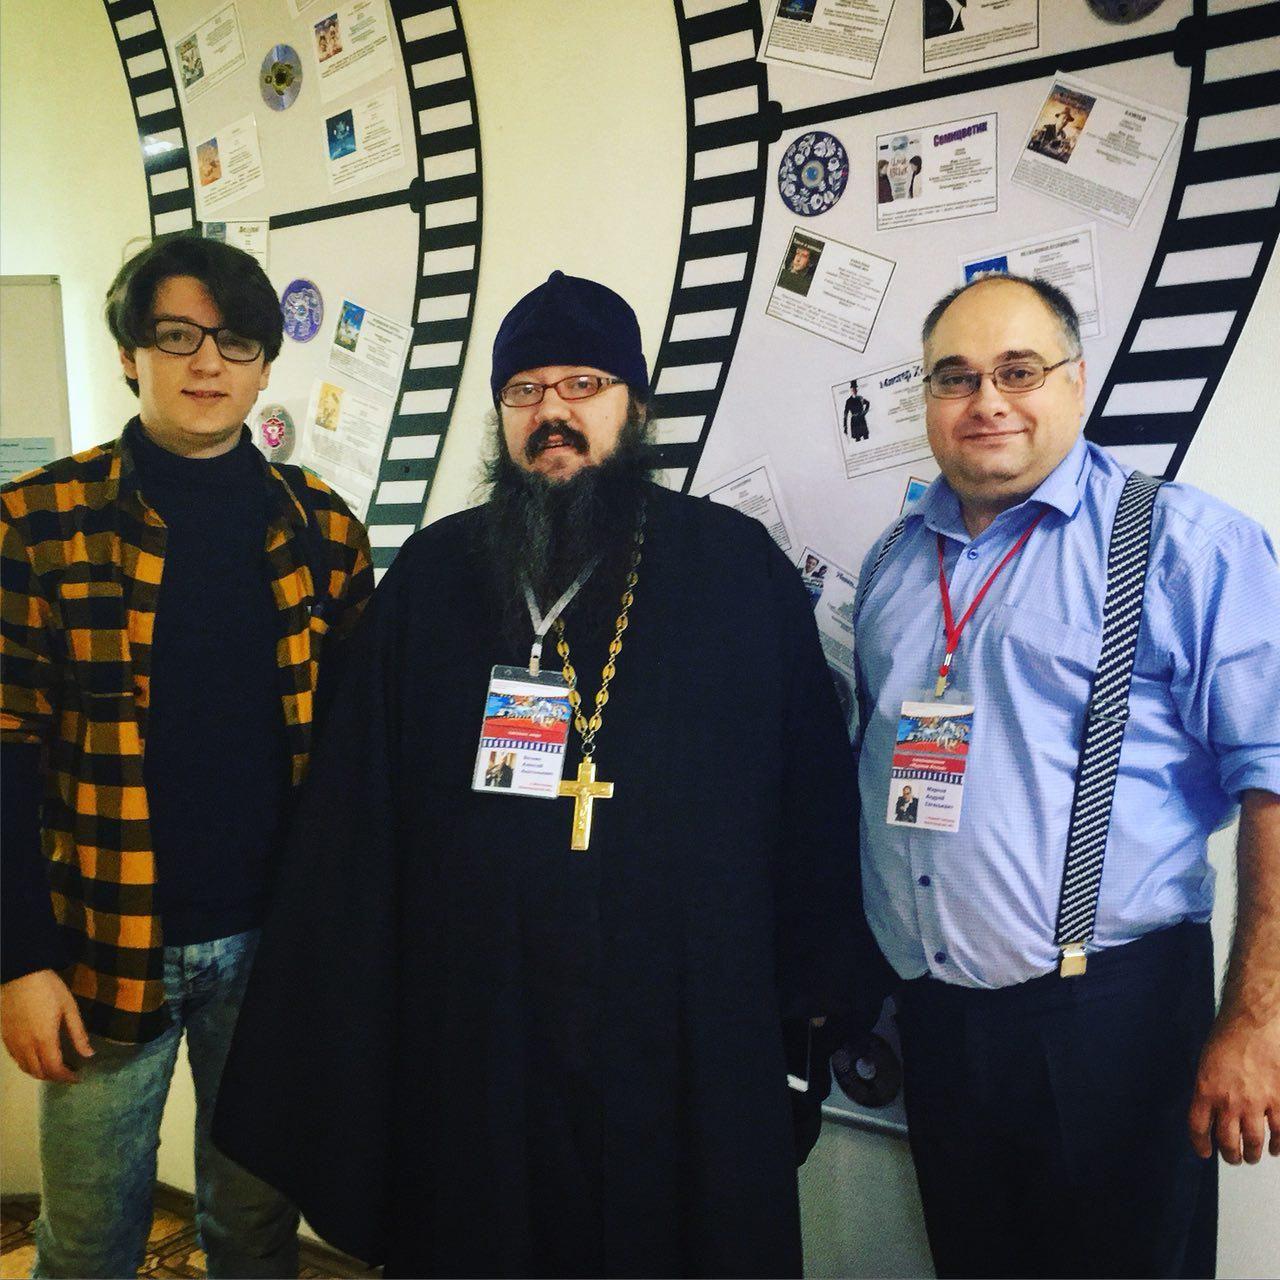 Нижегородский кинорежиссер победил нафестивале «Киностарт»